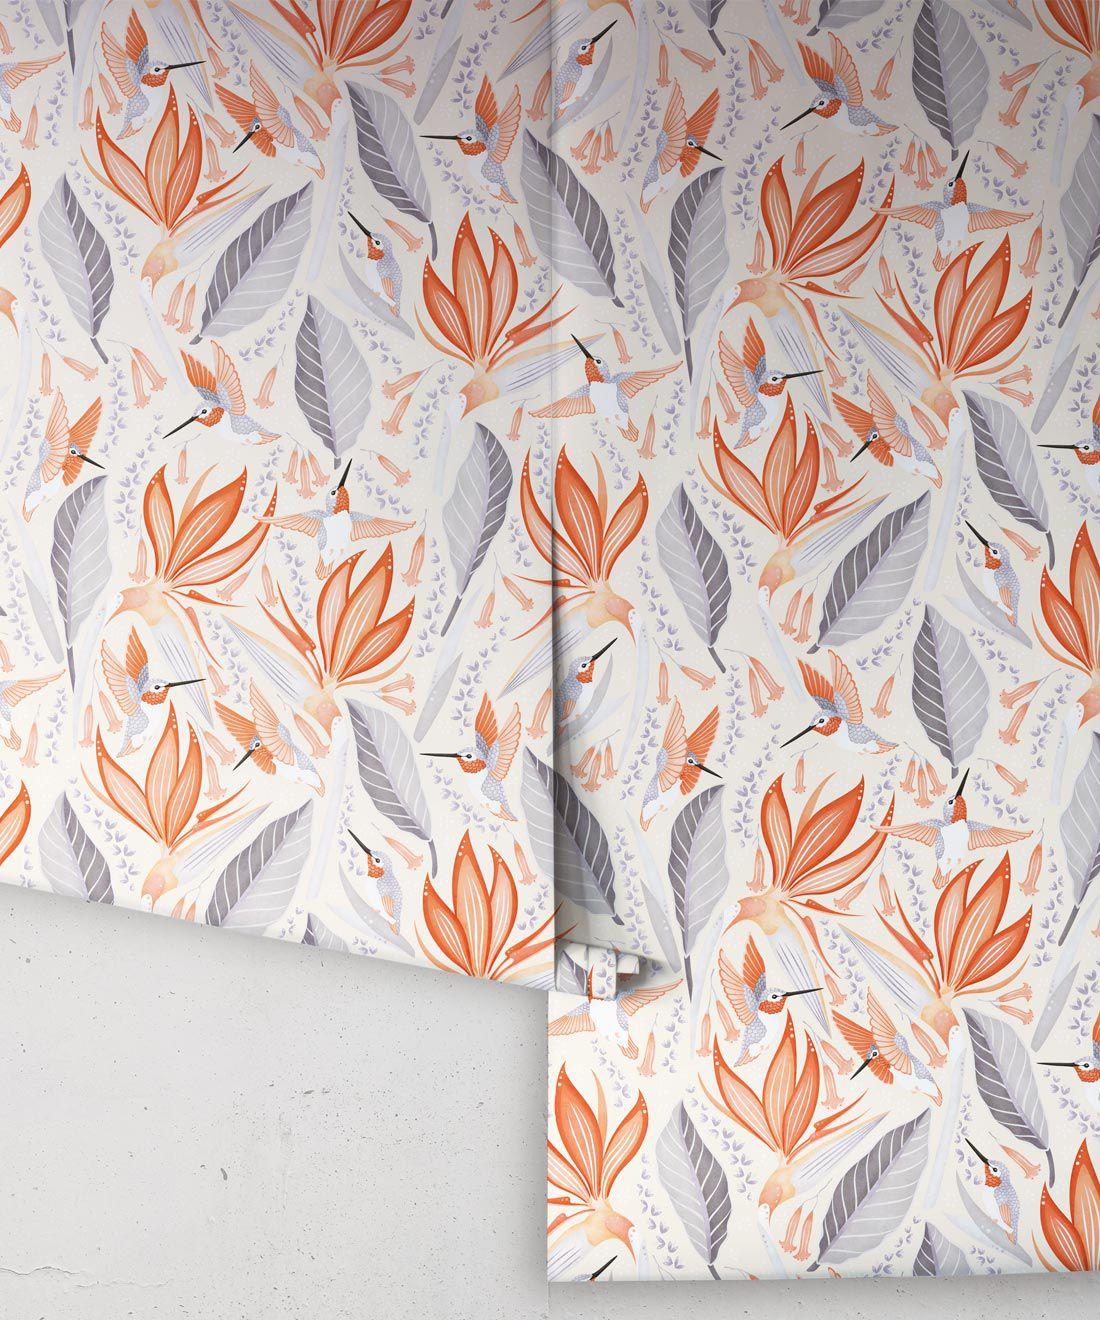 Hummingbird Wallpaper • Birds Of Paradise Flower • Bird Wallpaper Drops